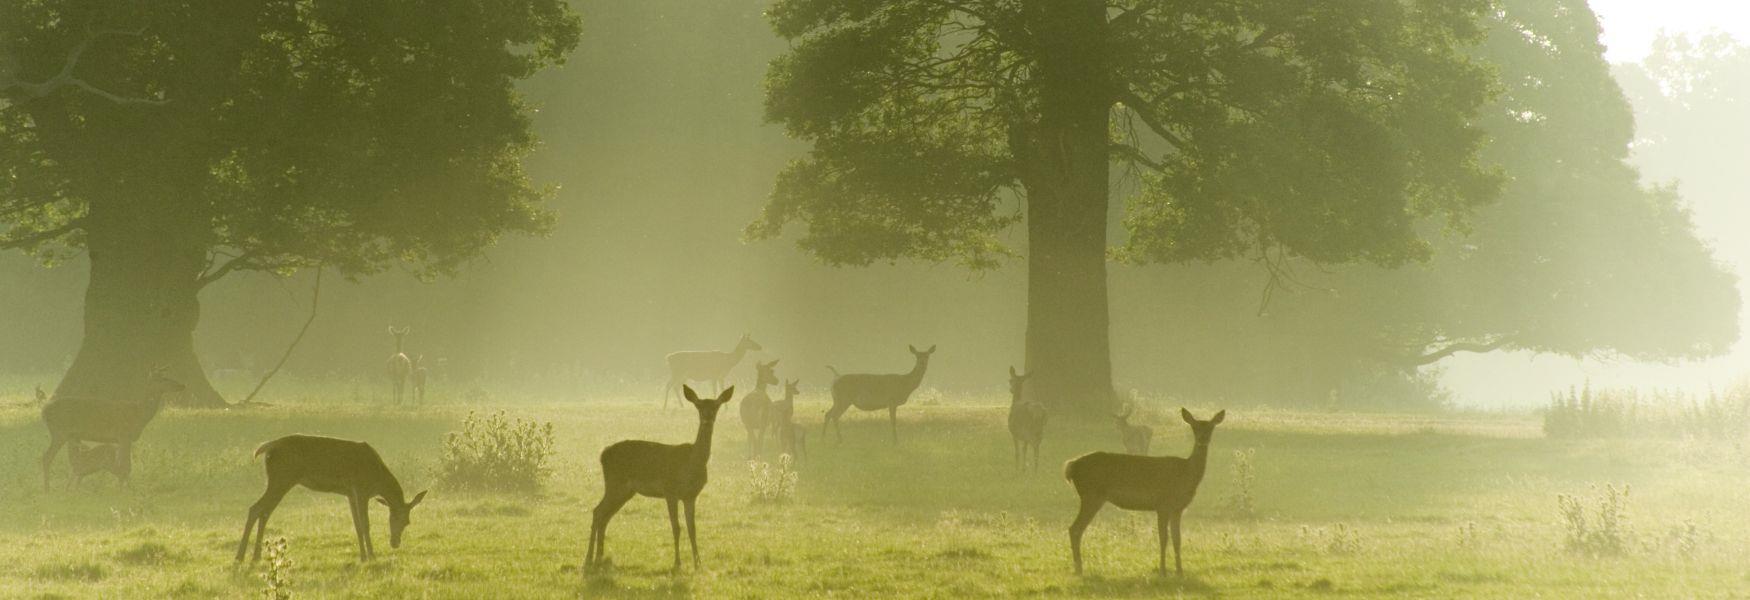 Red Deer in Windsor Great Park